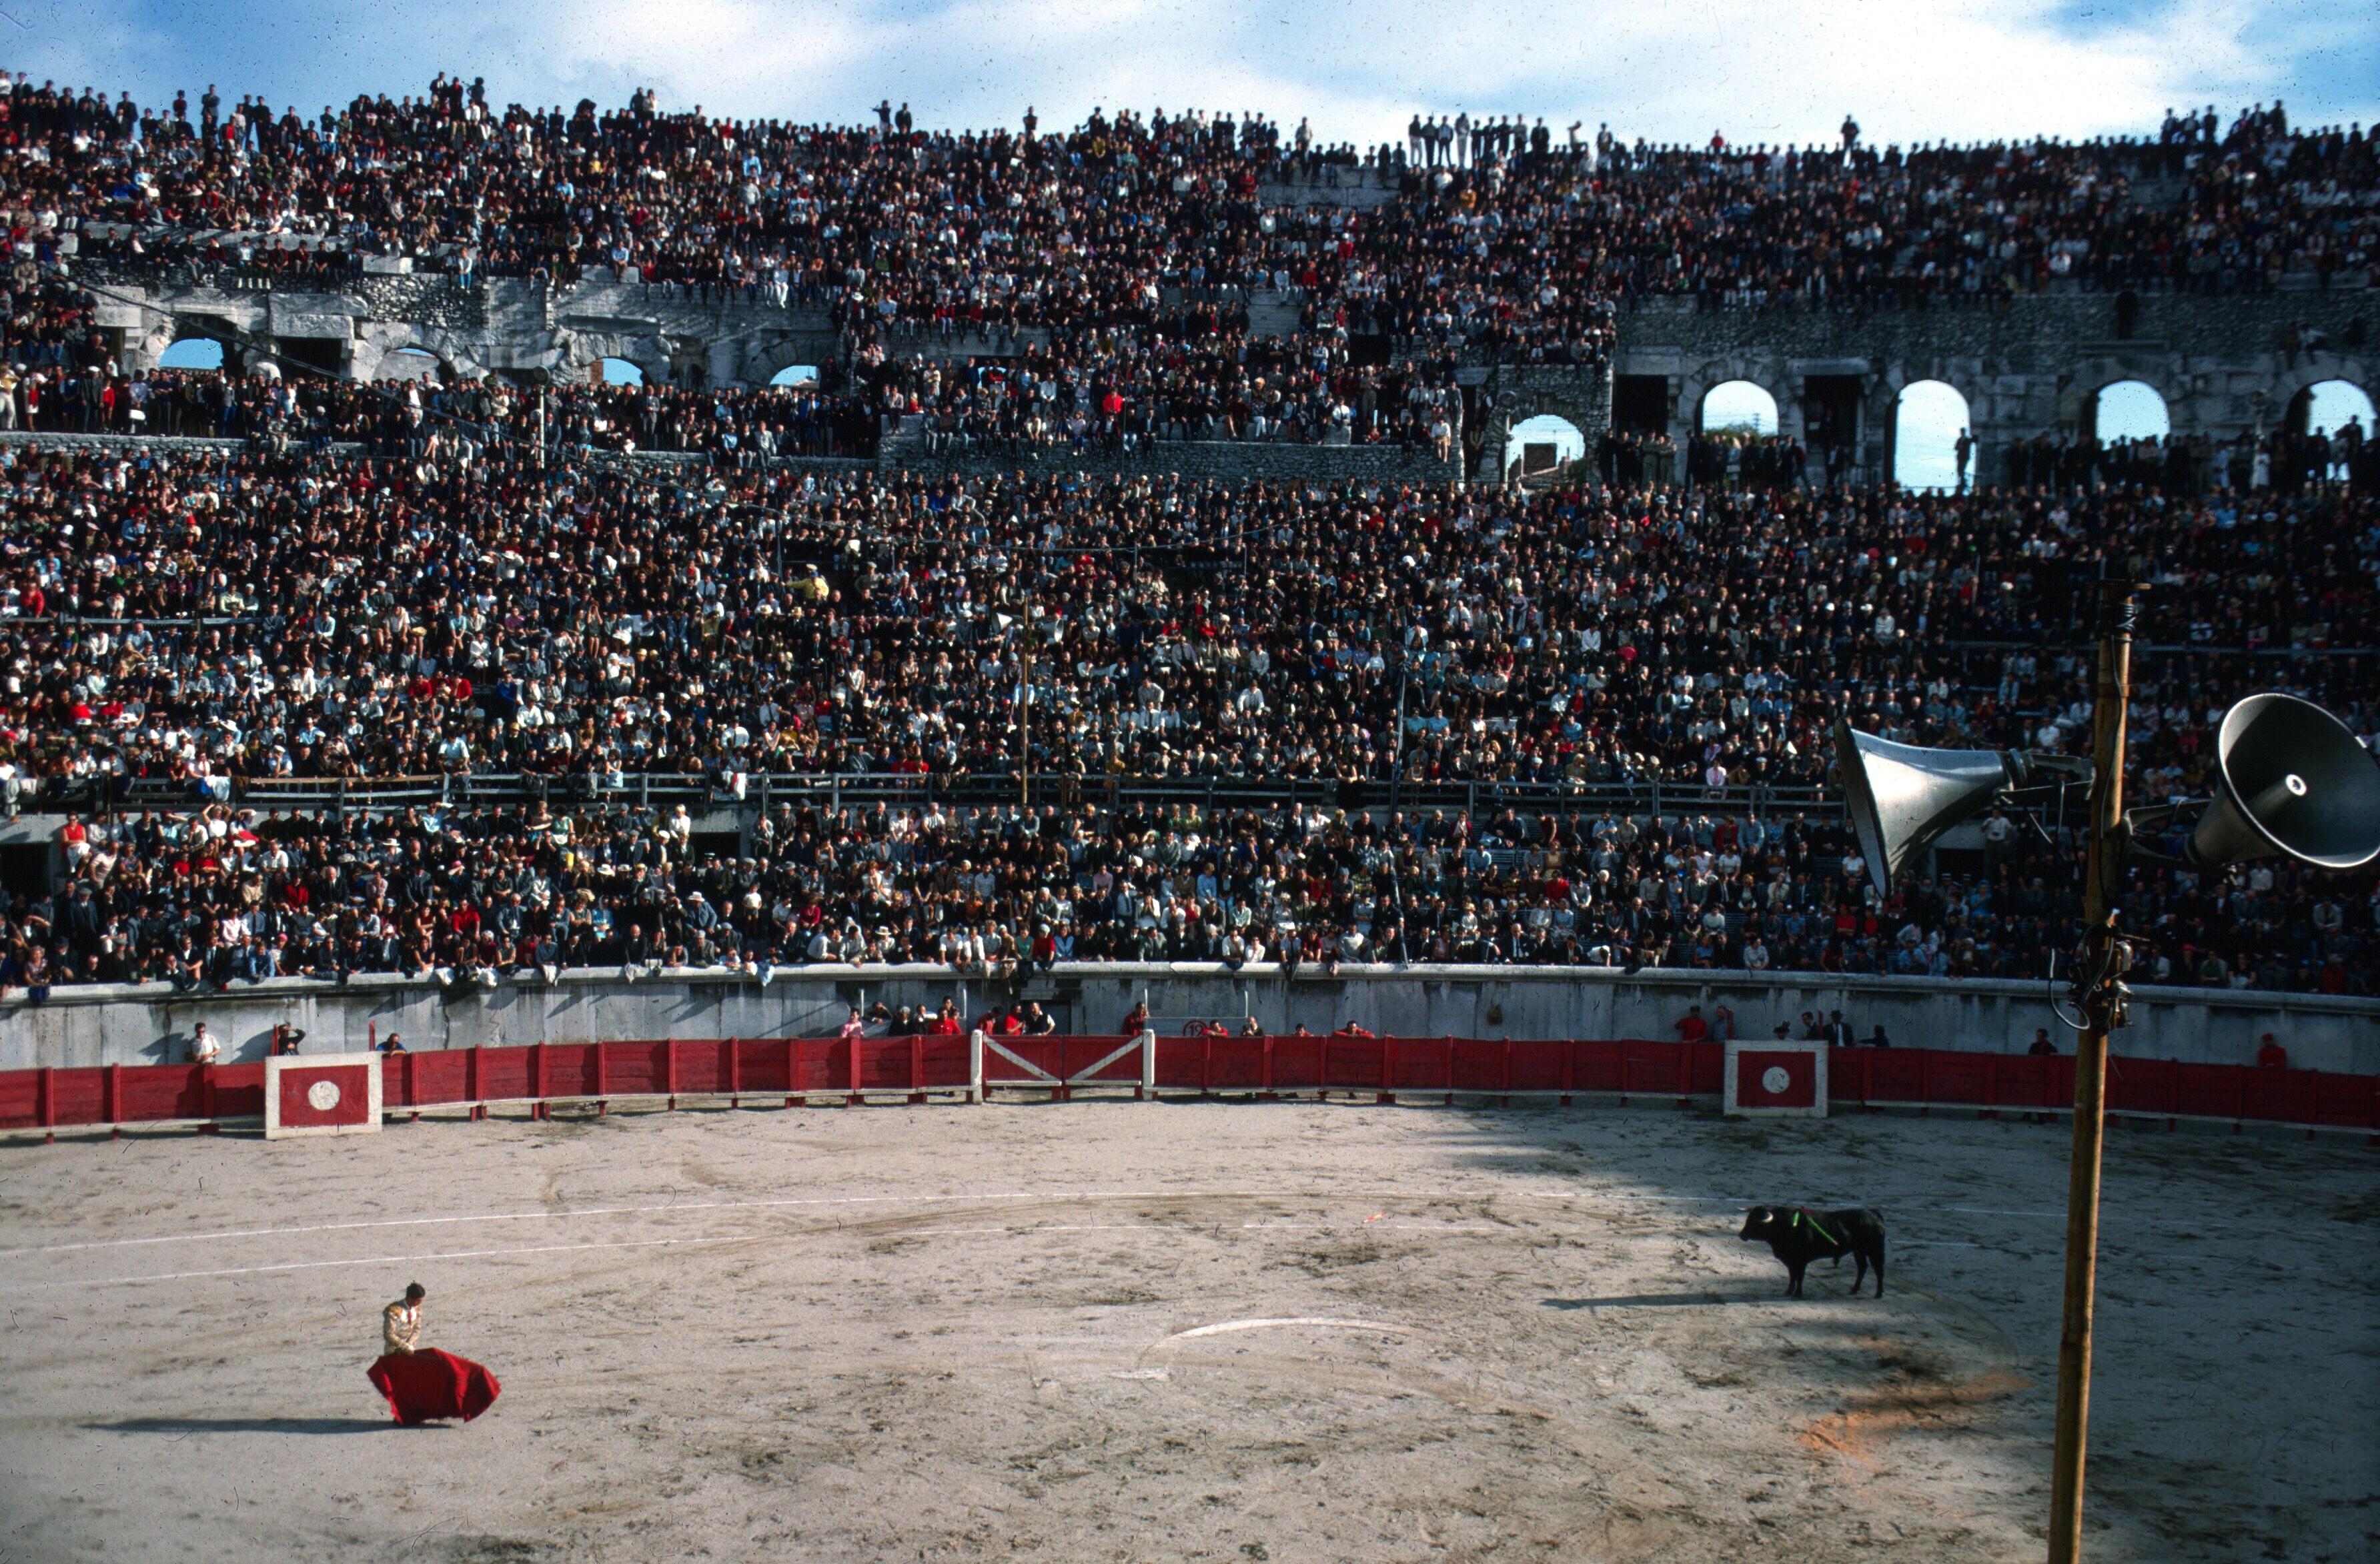 france nimes bullfight 1